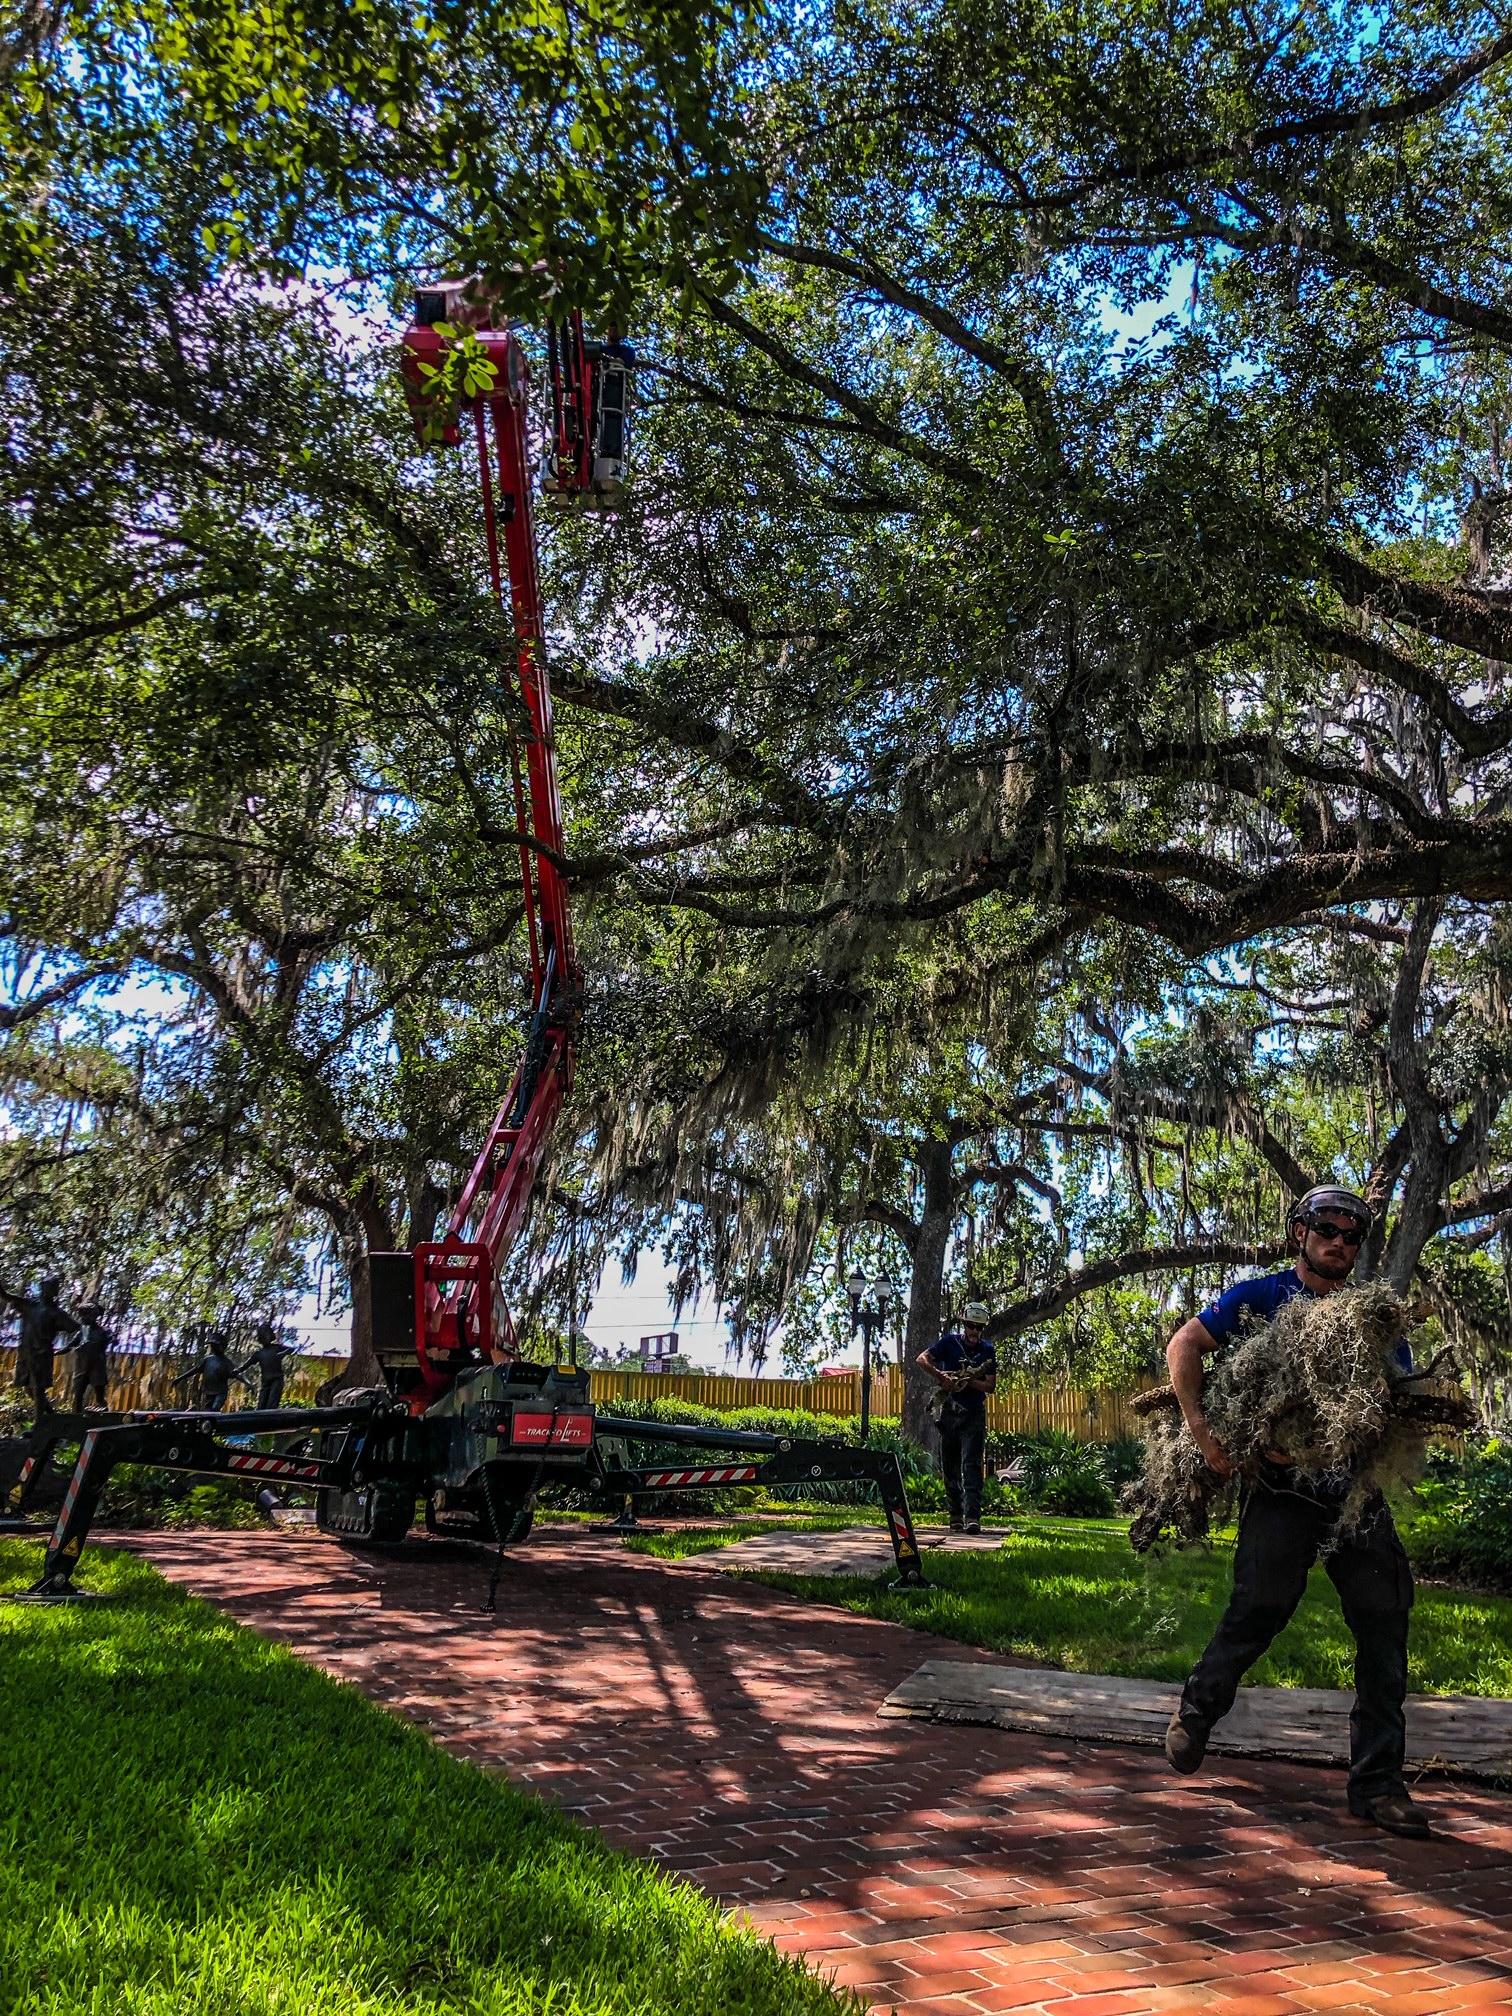 Track Lift Man Lift for Tight Access Tree Jobs